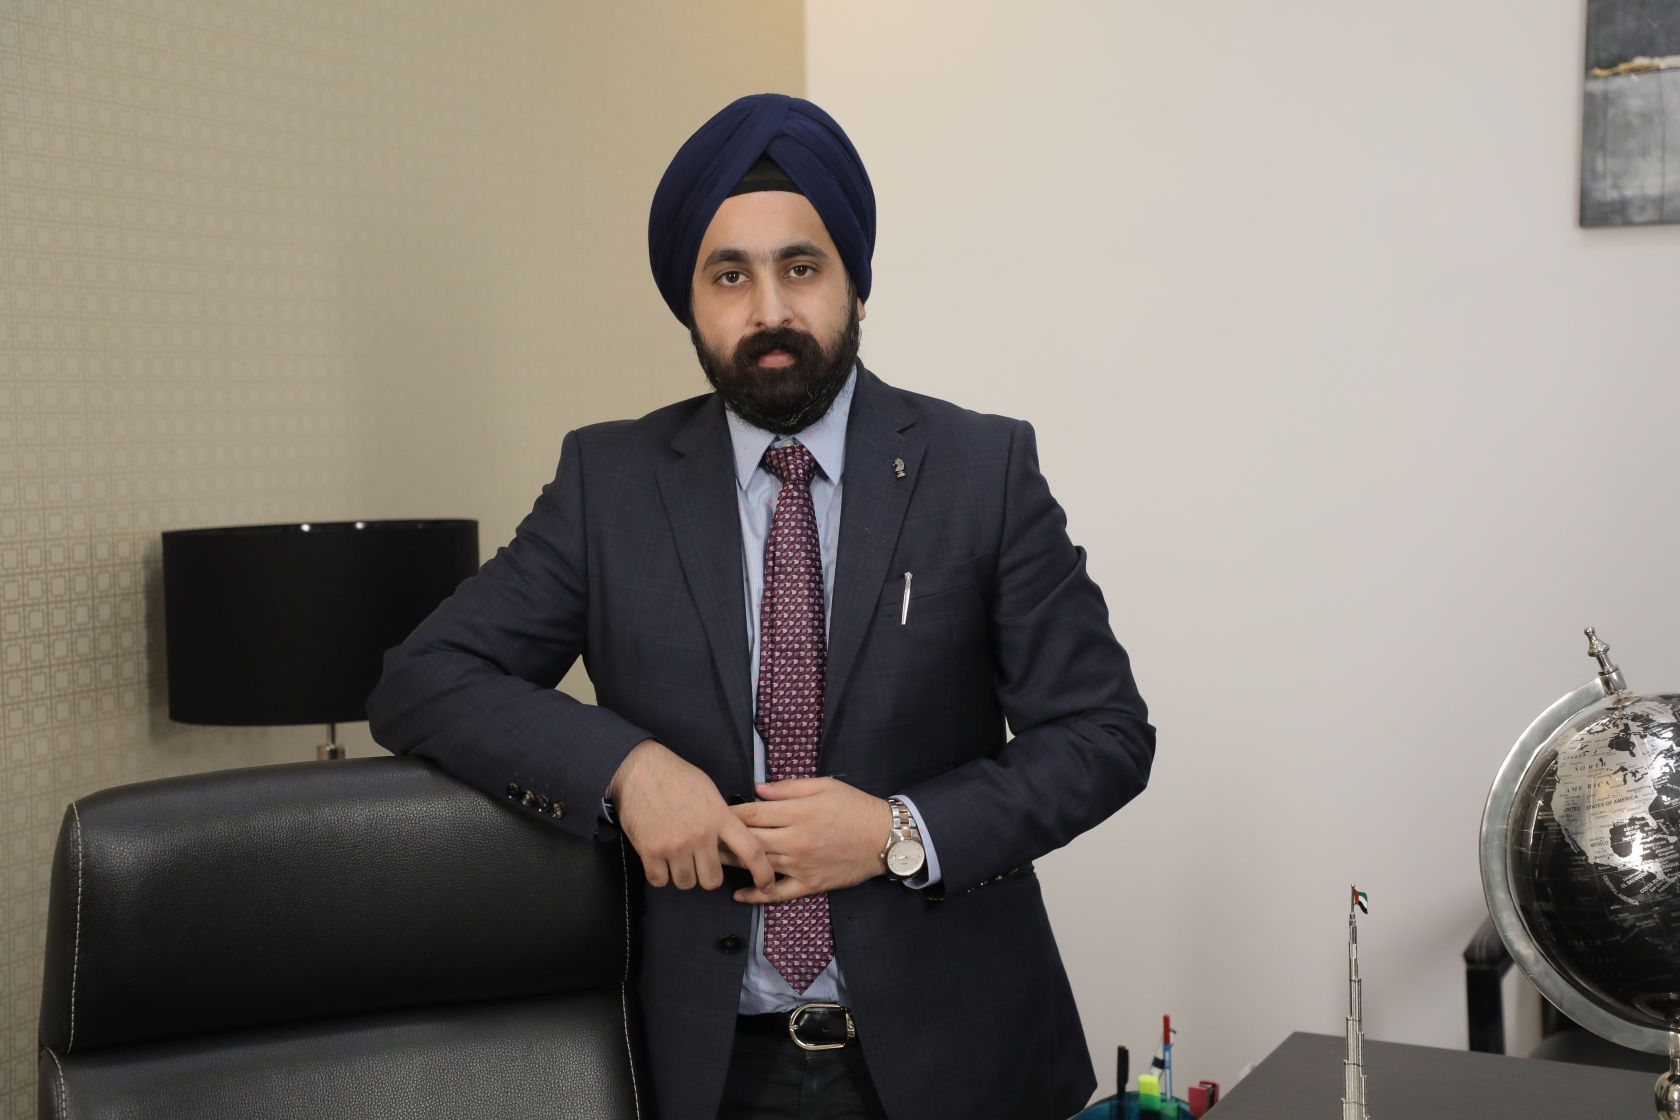 Karan Bedi COO Blaupunkt Televisions India